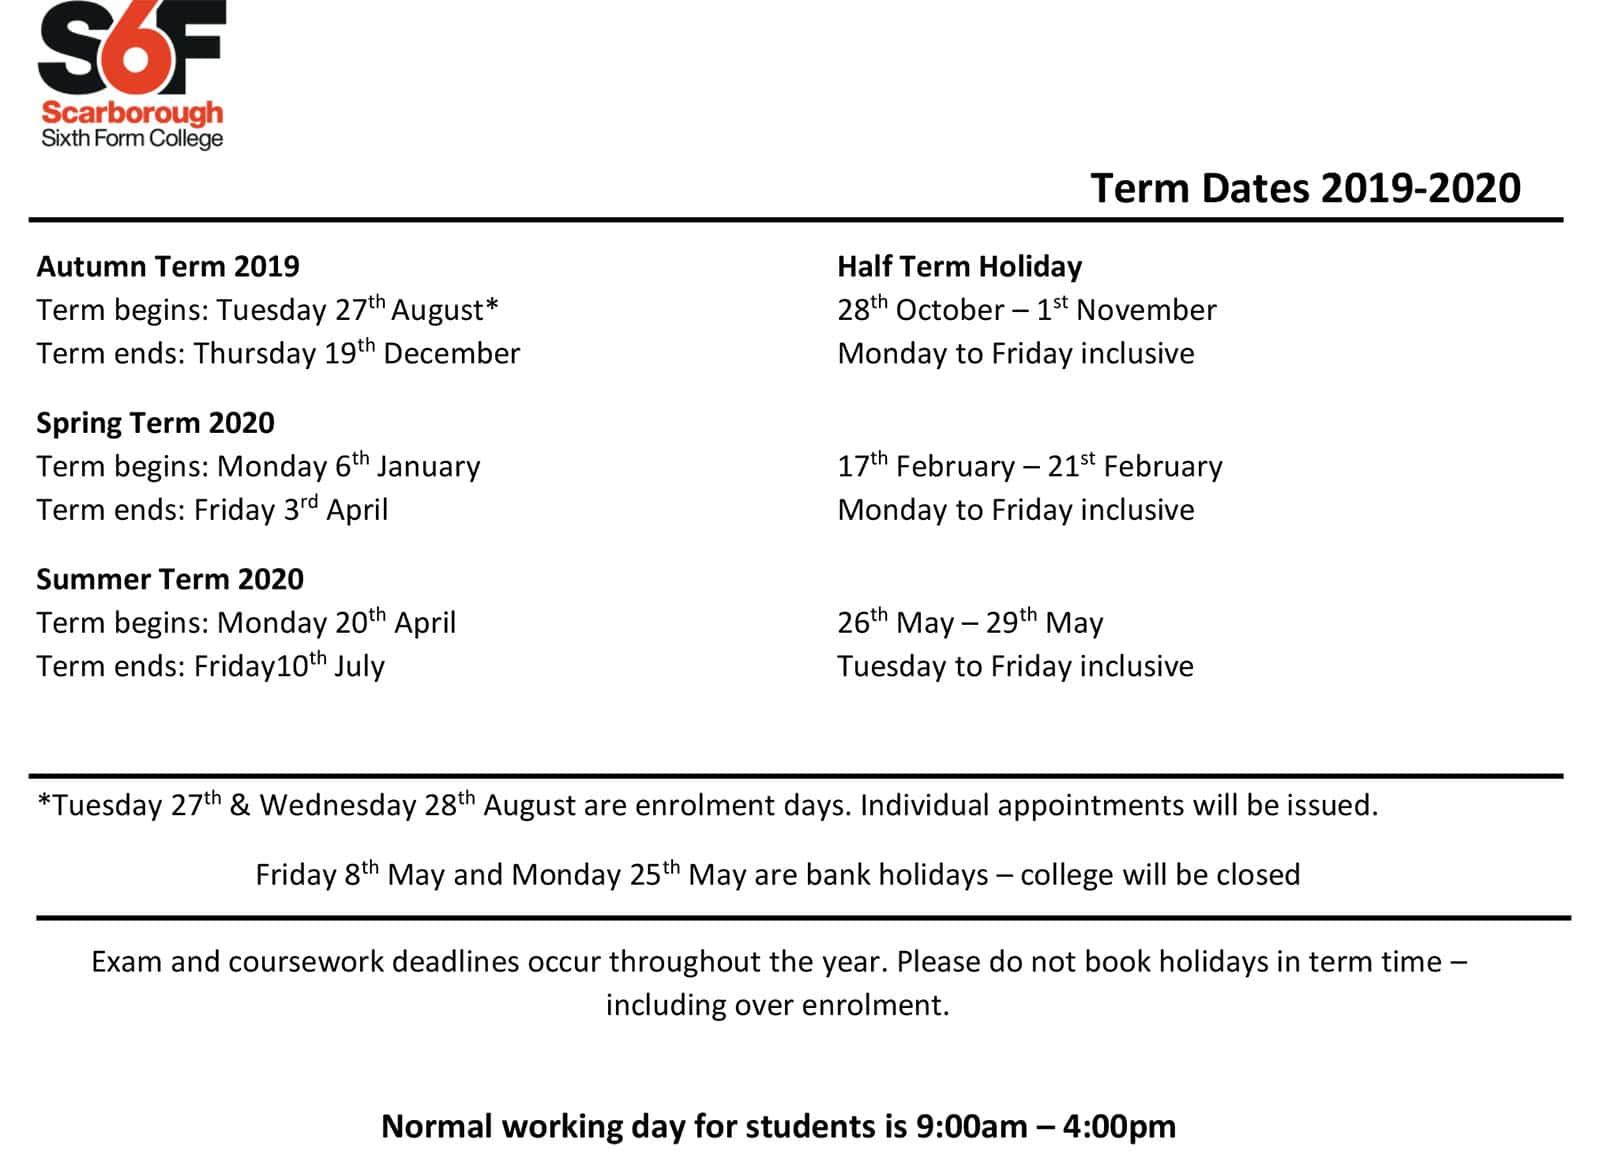 Term Dates Scarborough Sixth Form College